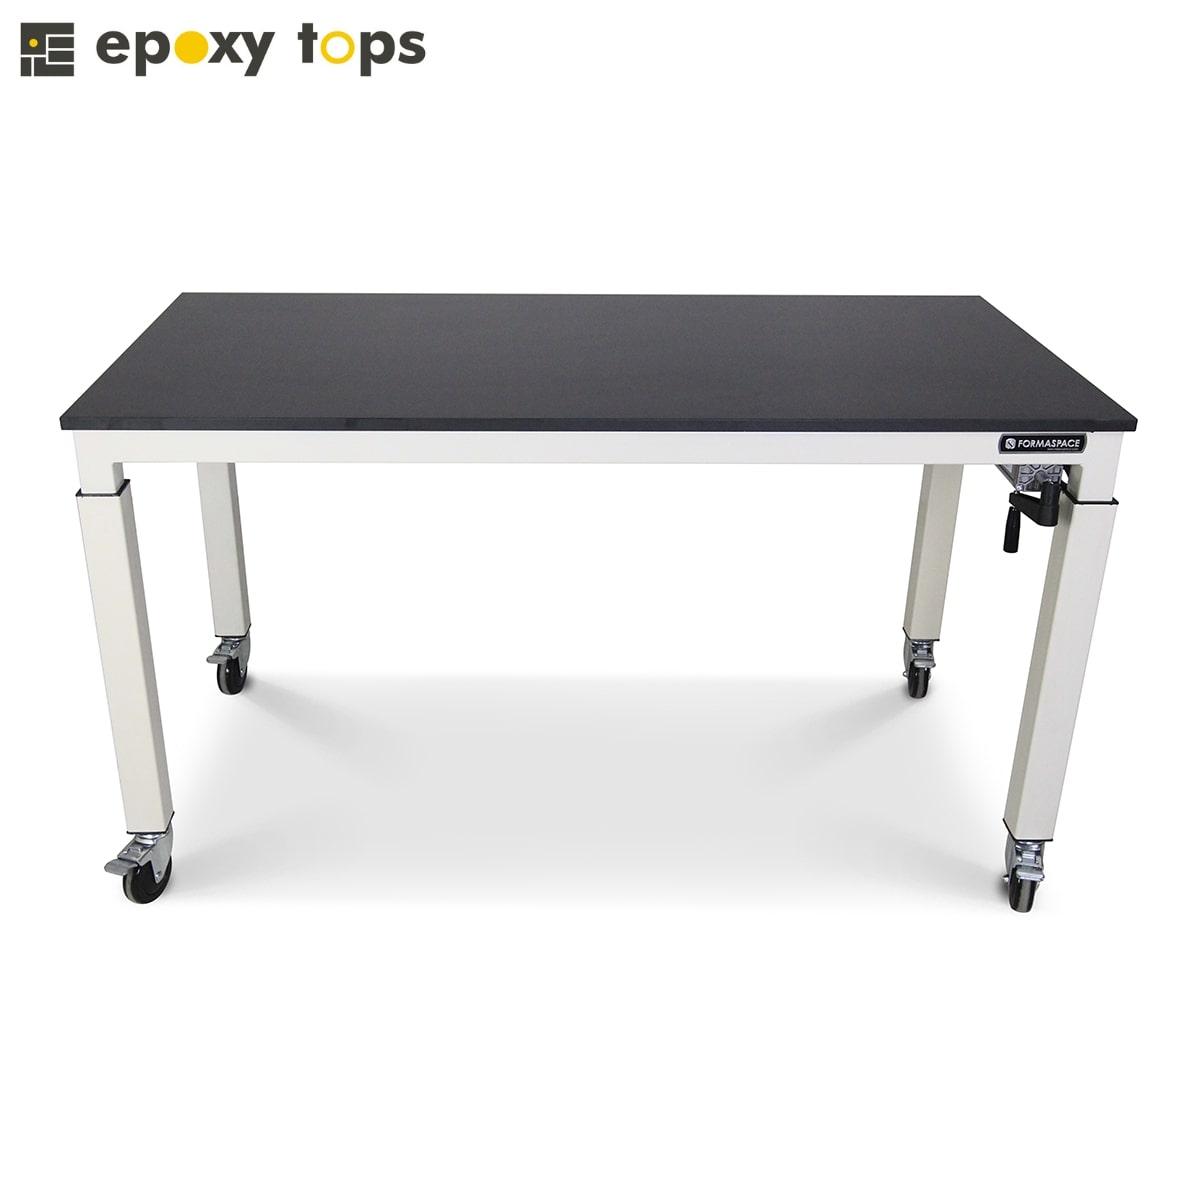 adaptable workbench made of phenolic resin